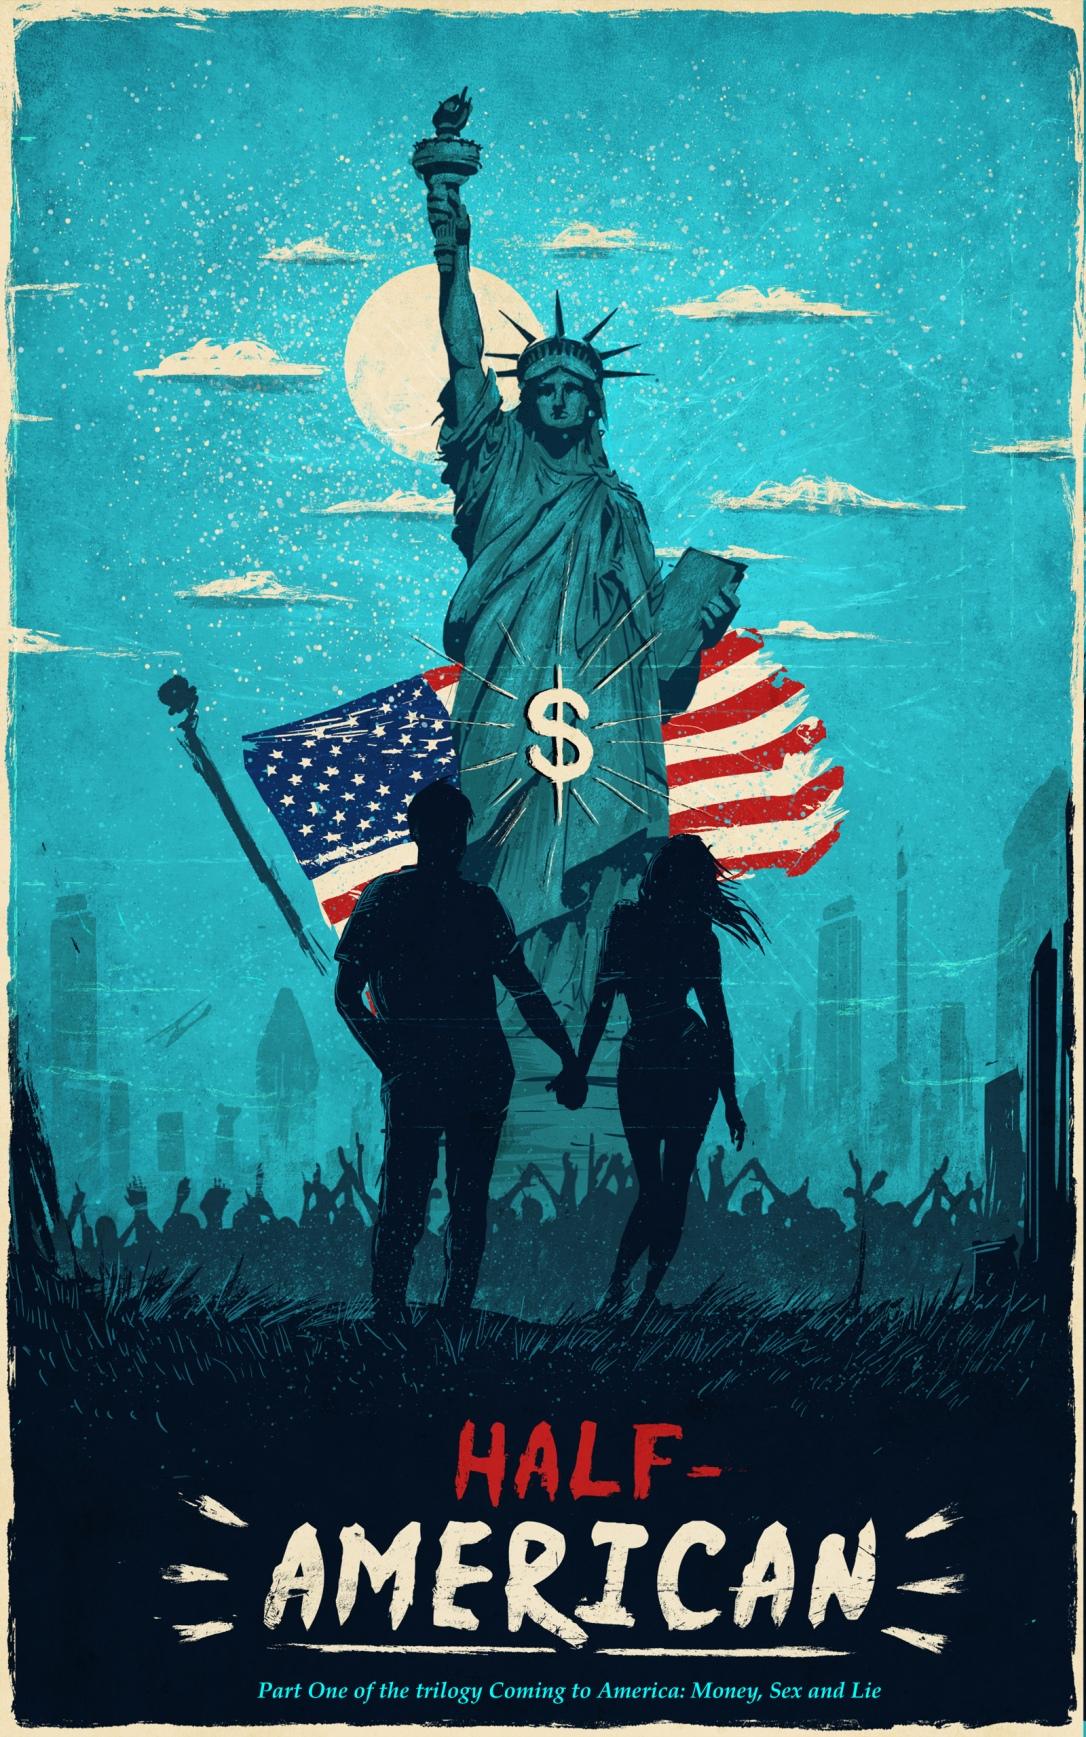 Обложка-Америка (1600x2560)_part 1 camsl